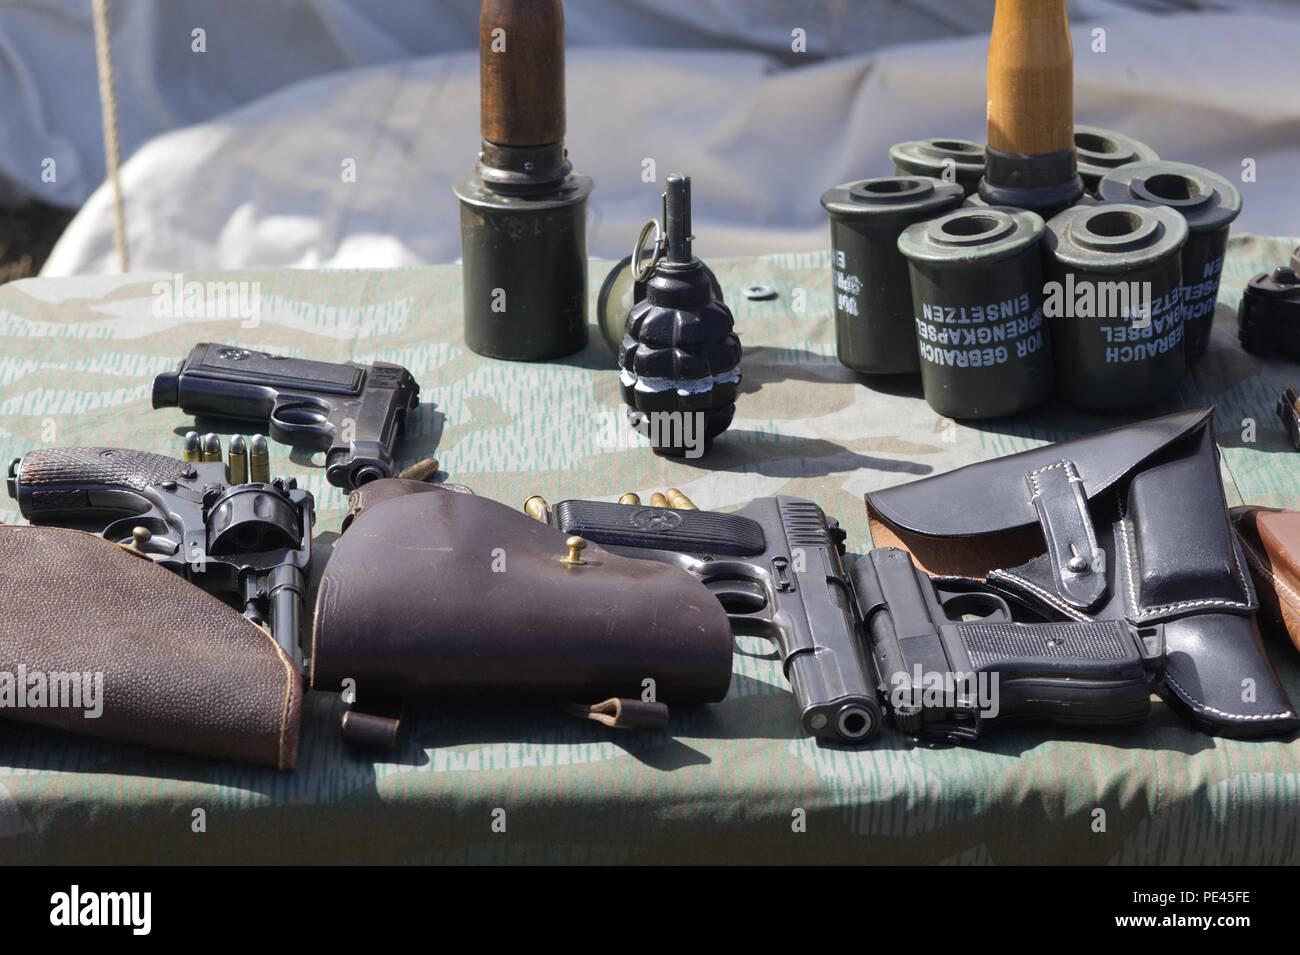 German grenades and handguns on display - Stock Image